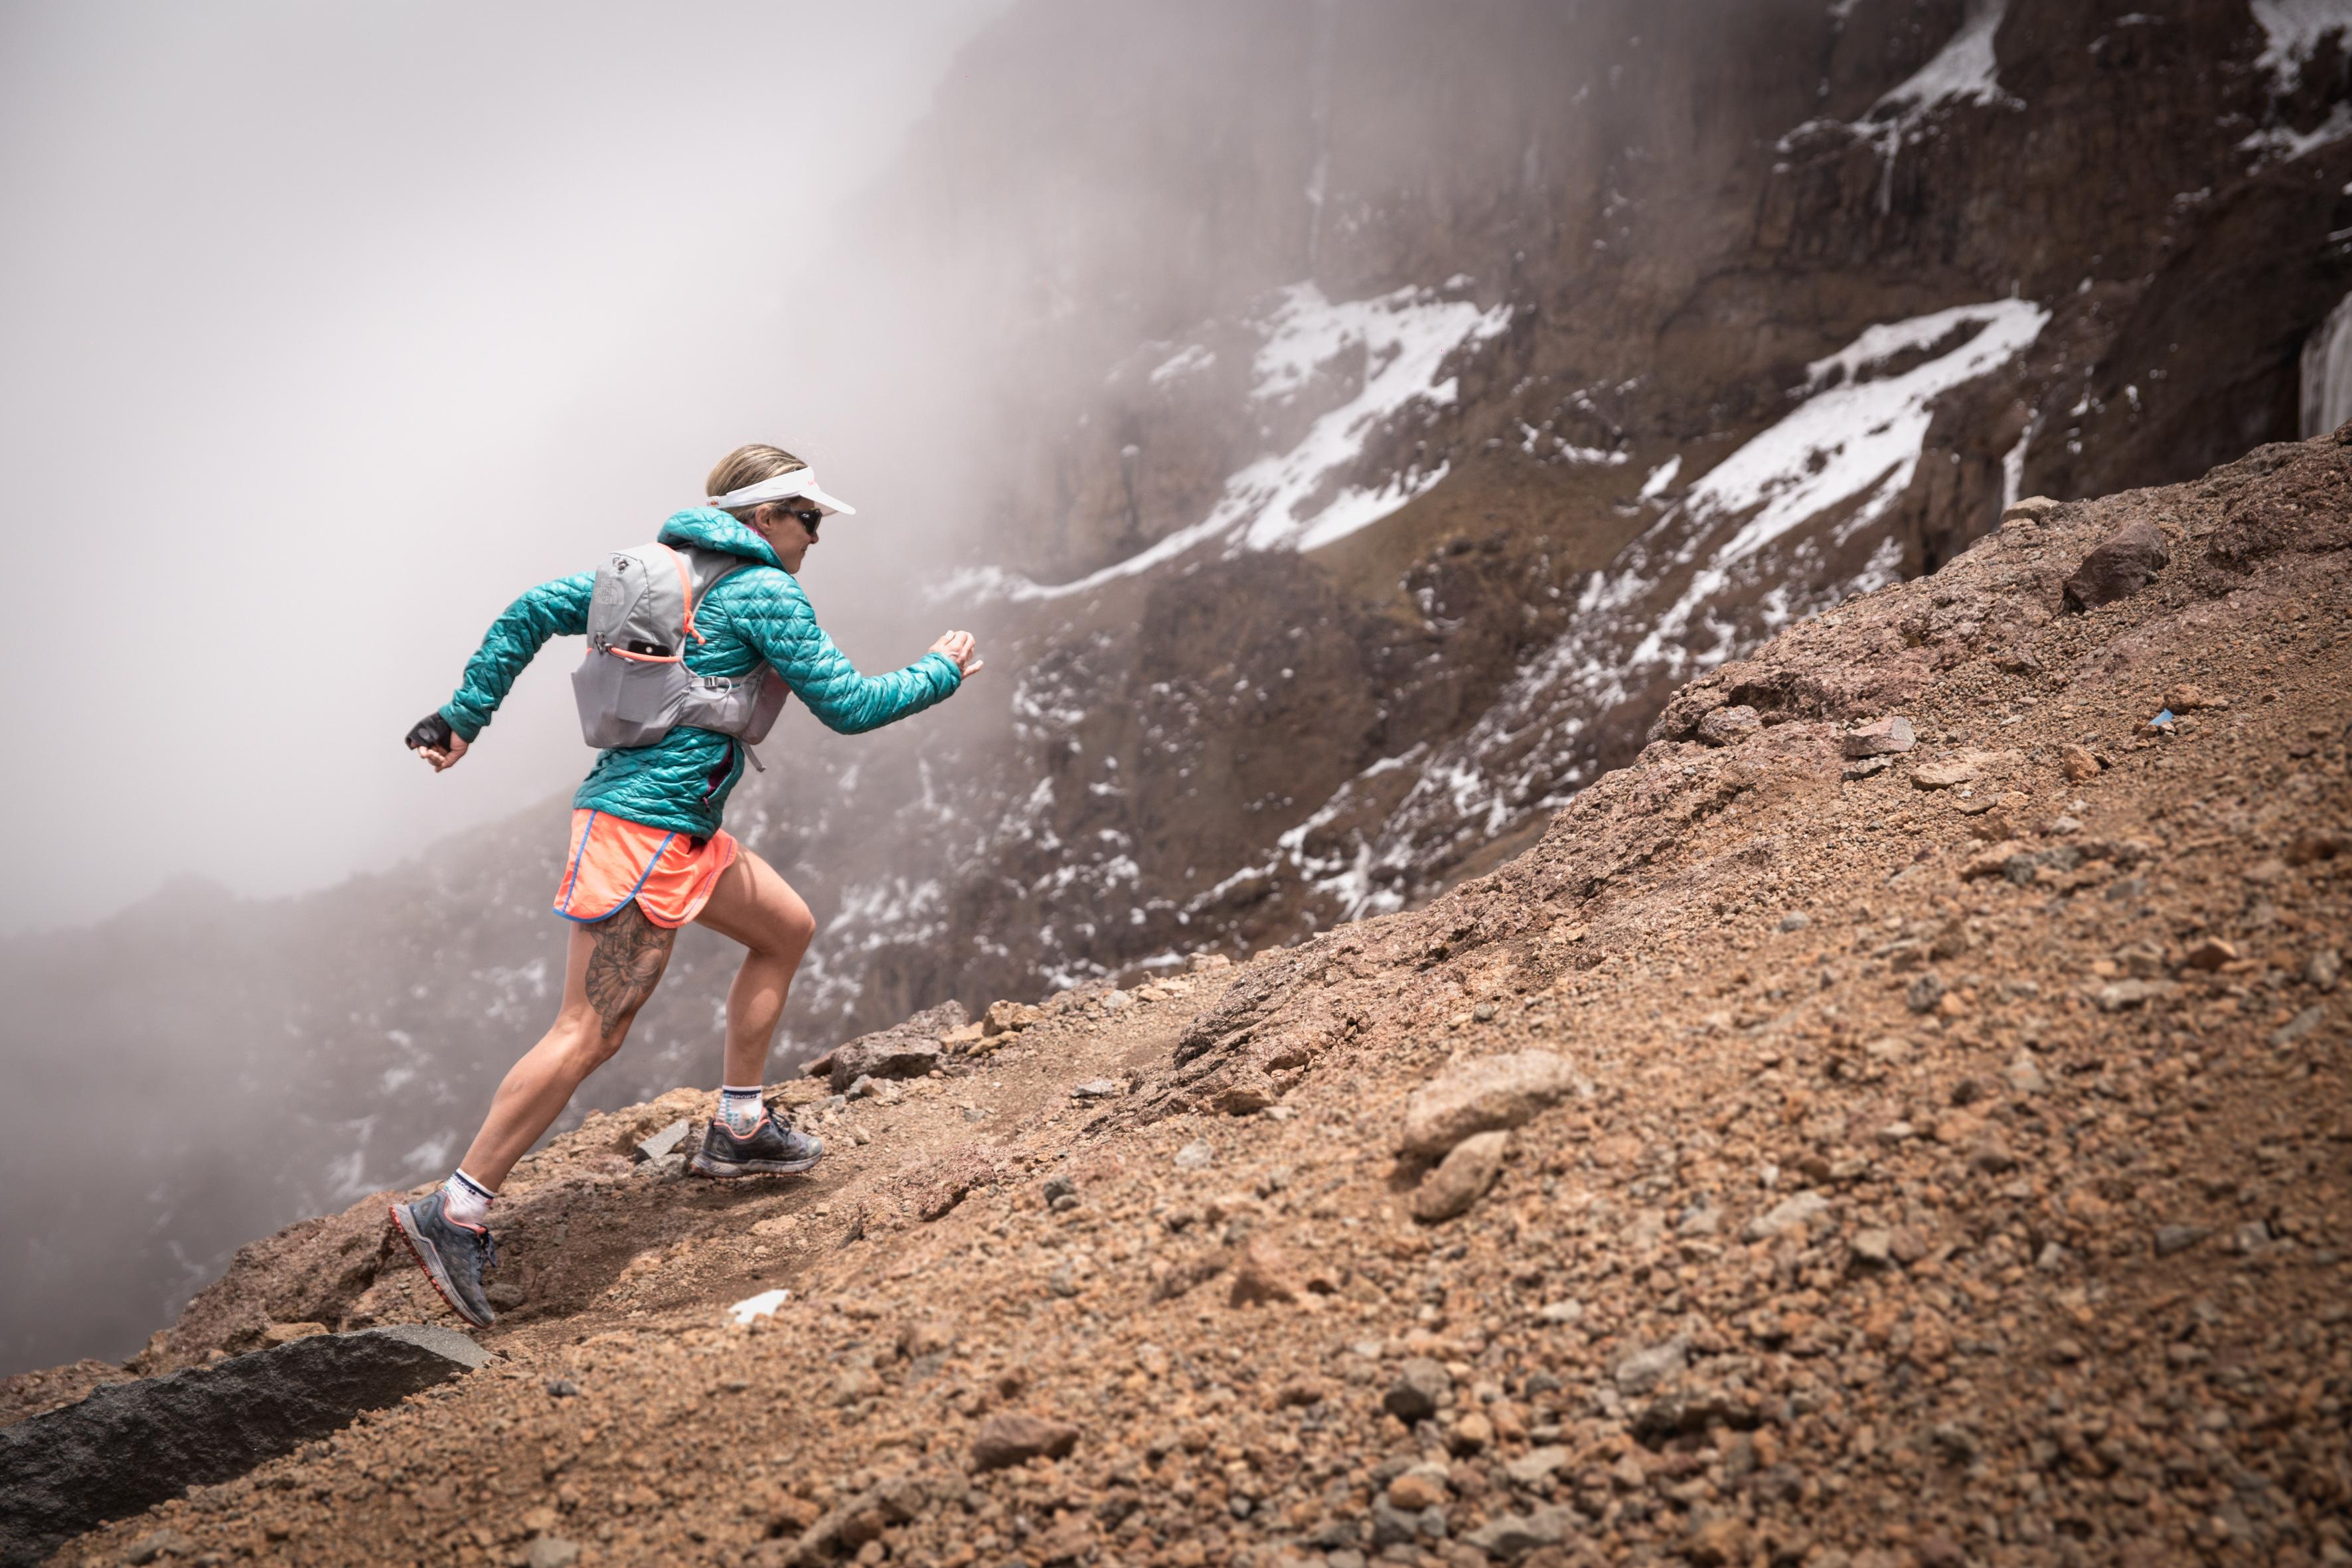 New film 'Taking Flight on Kilimanjaro' starring Fernanda Maciel